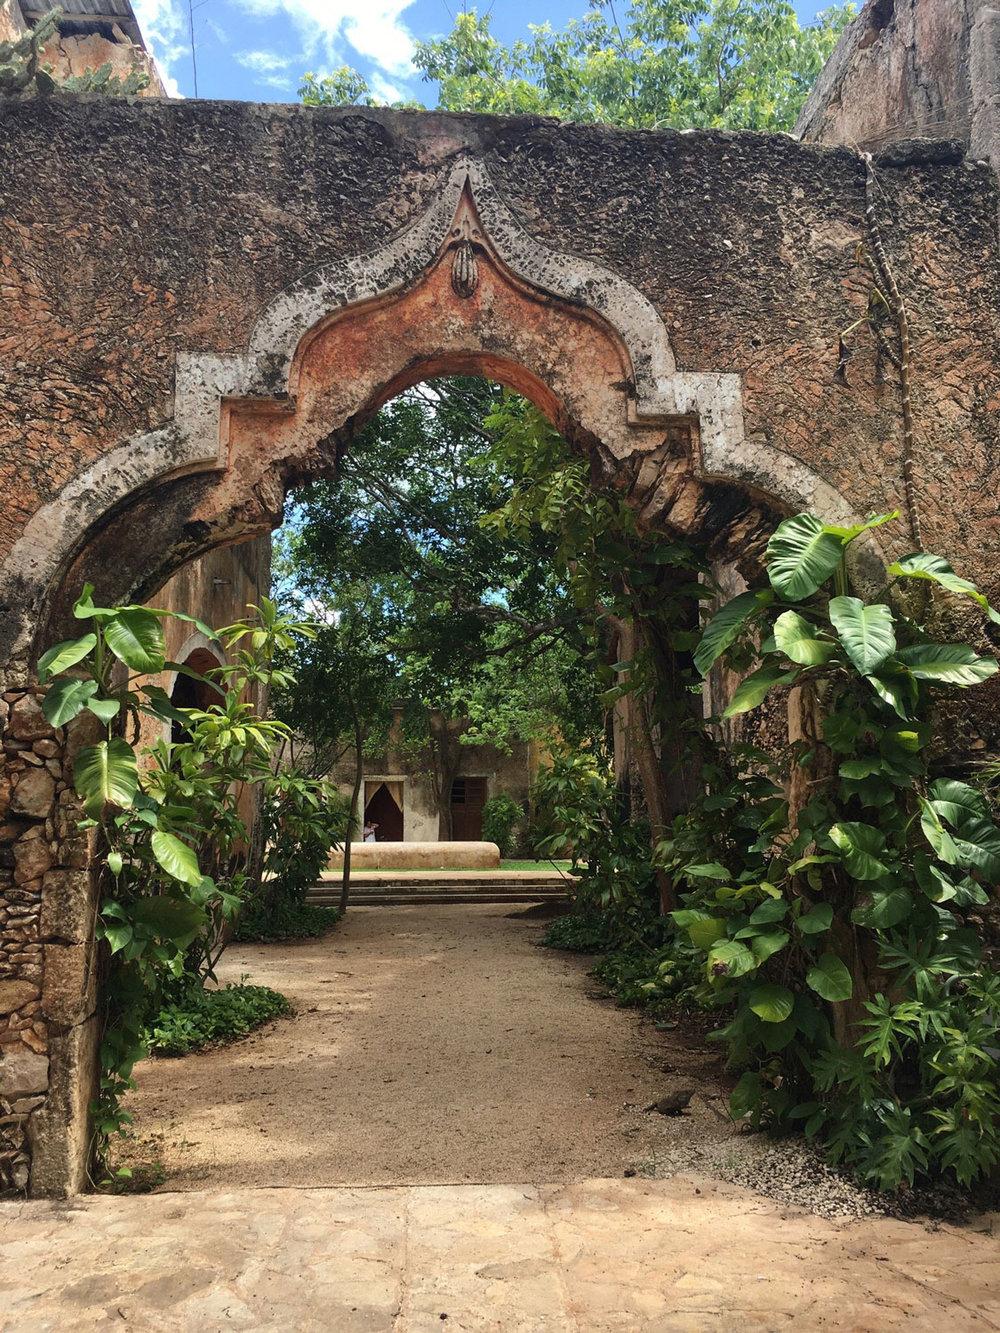 Hammocks_and_Ruins_Blog_Riviera_Maya_Mexico_Travel_Discover_Yucatan_What_to_do_Hacienda_Ochil_32.jpg